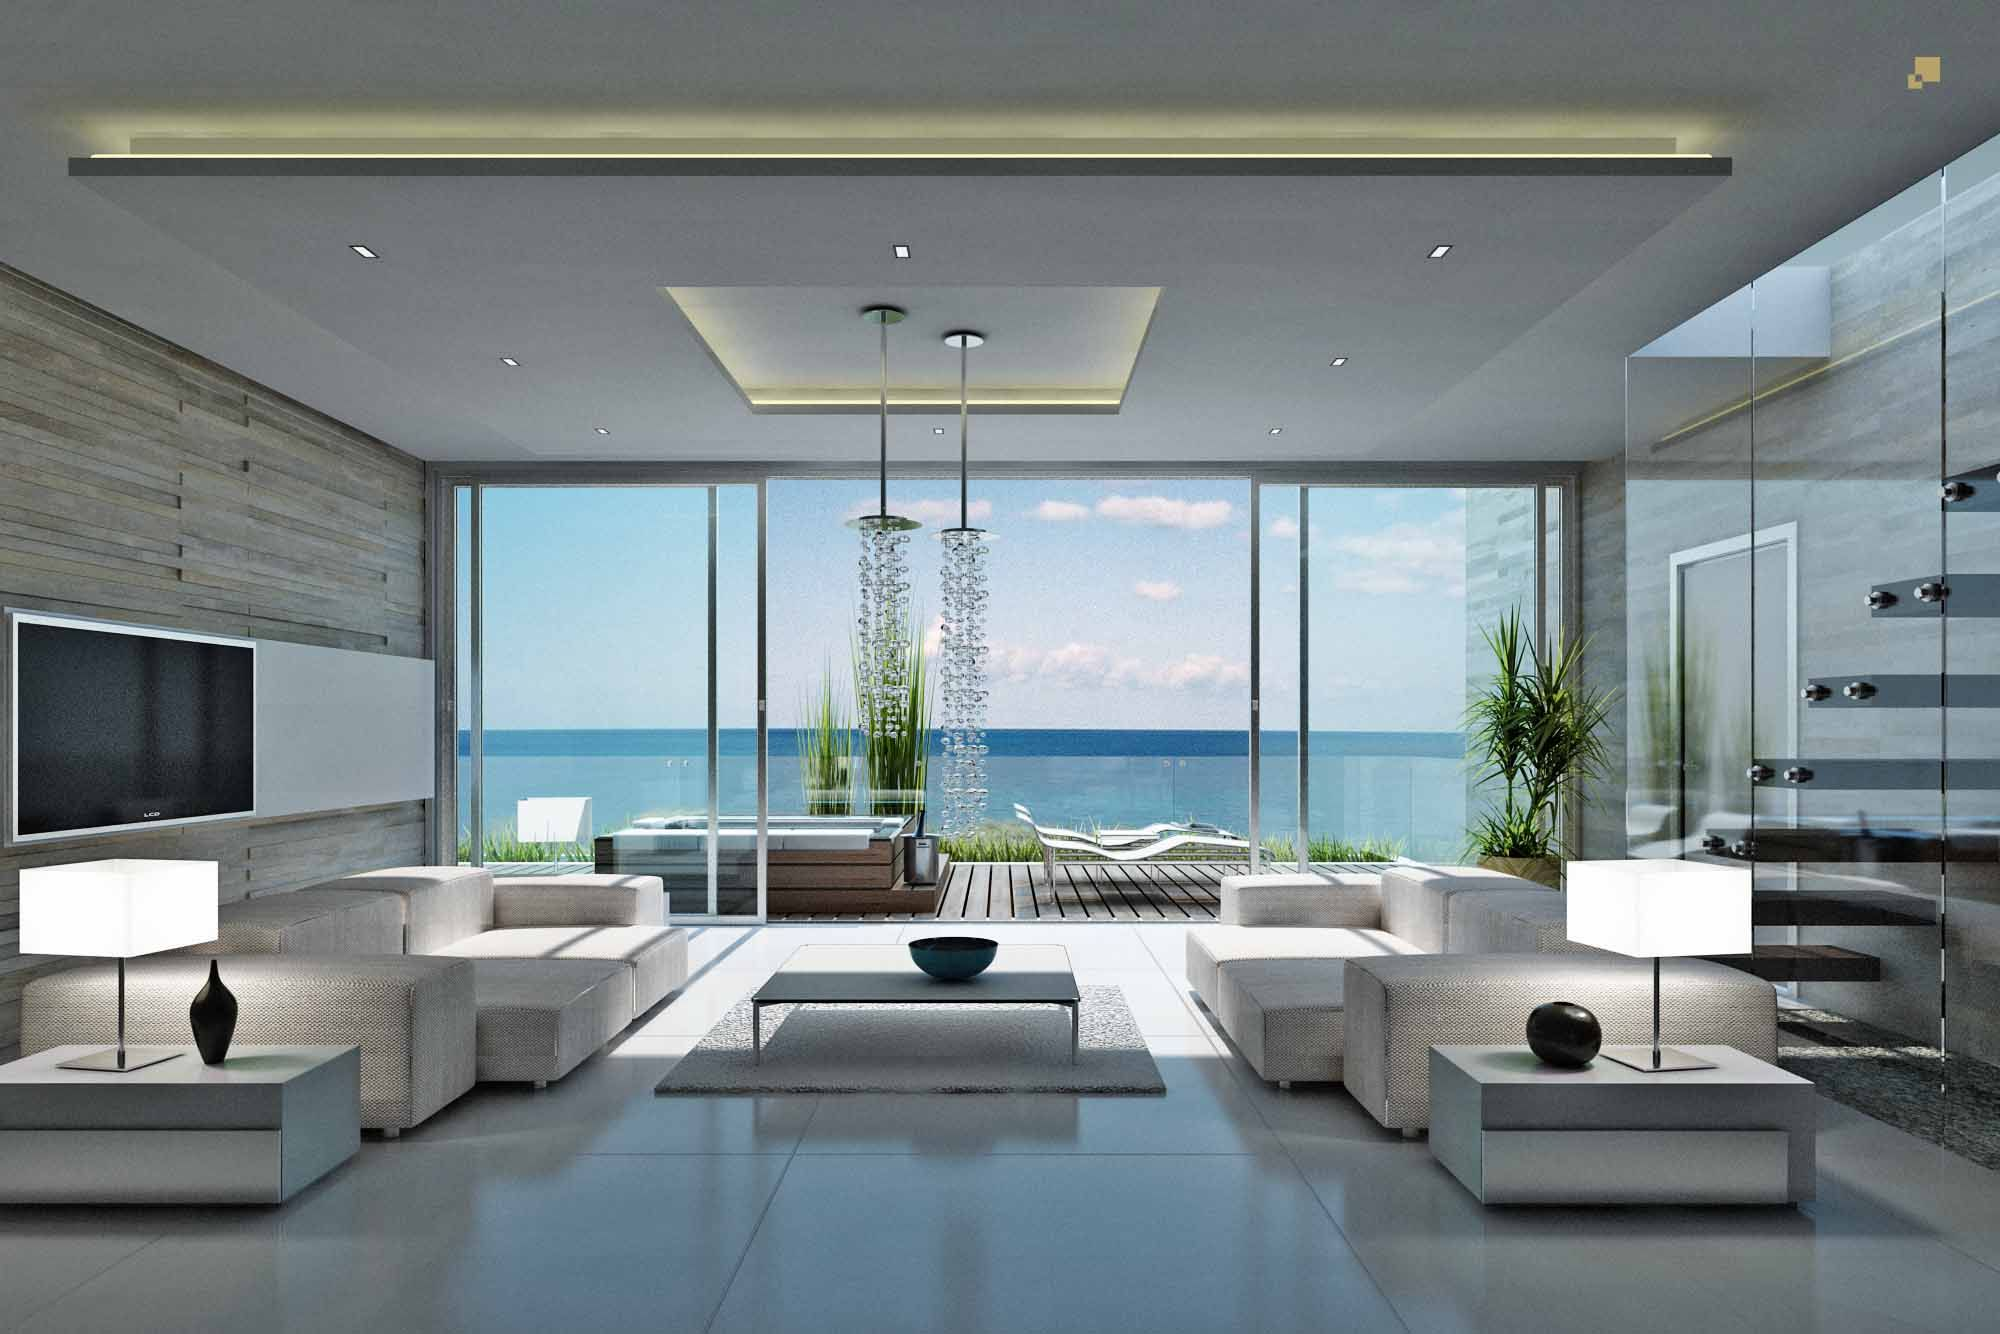 будут картинки интерьера квартиры дома собранная вместе